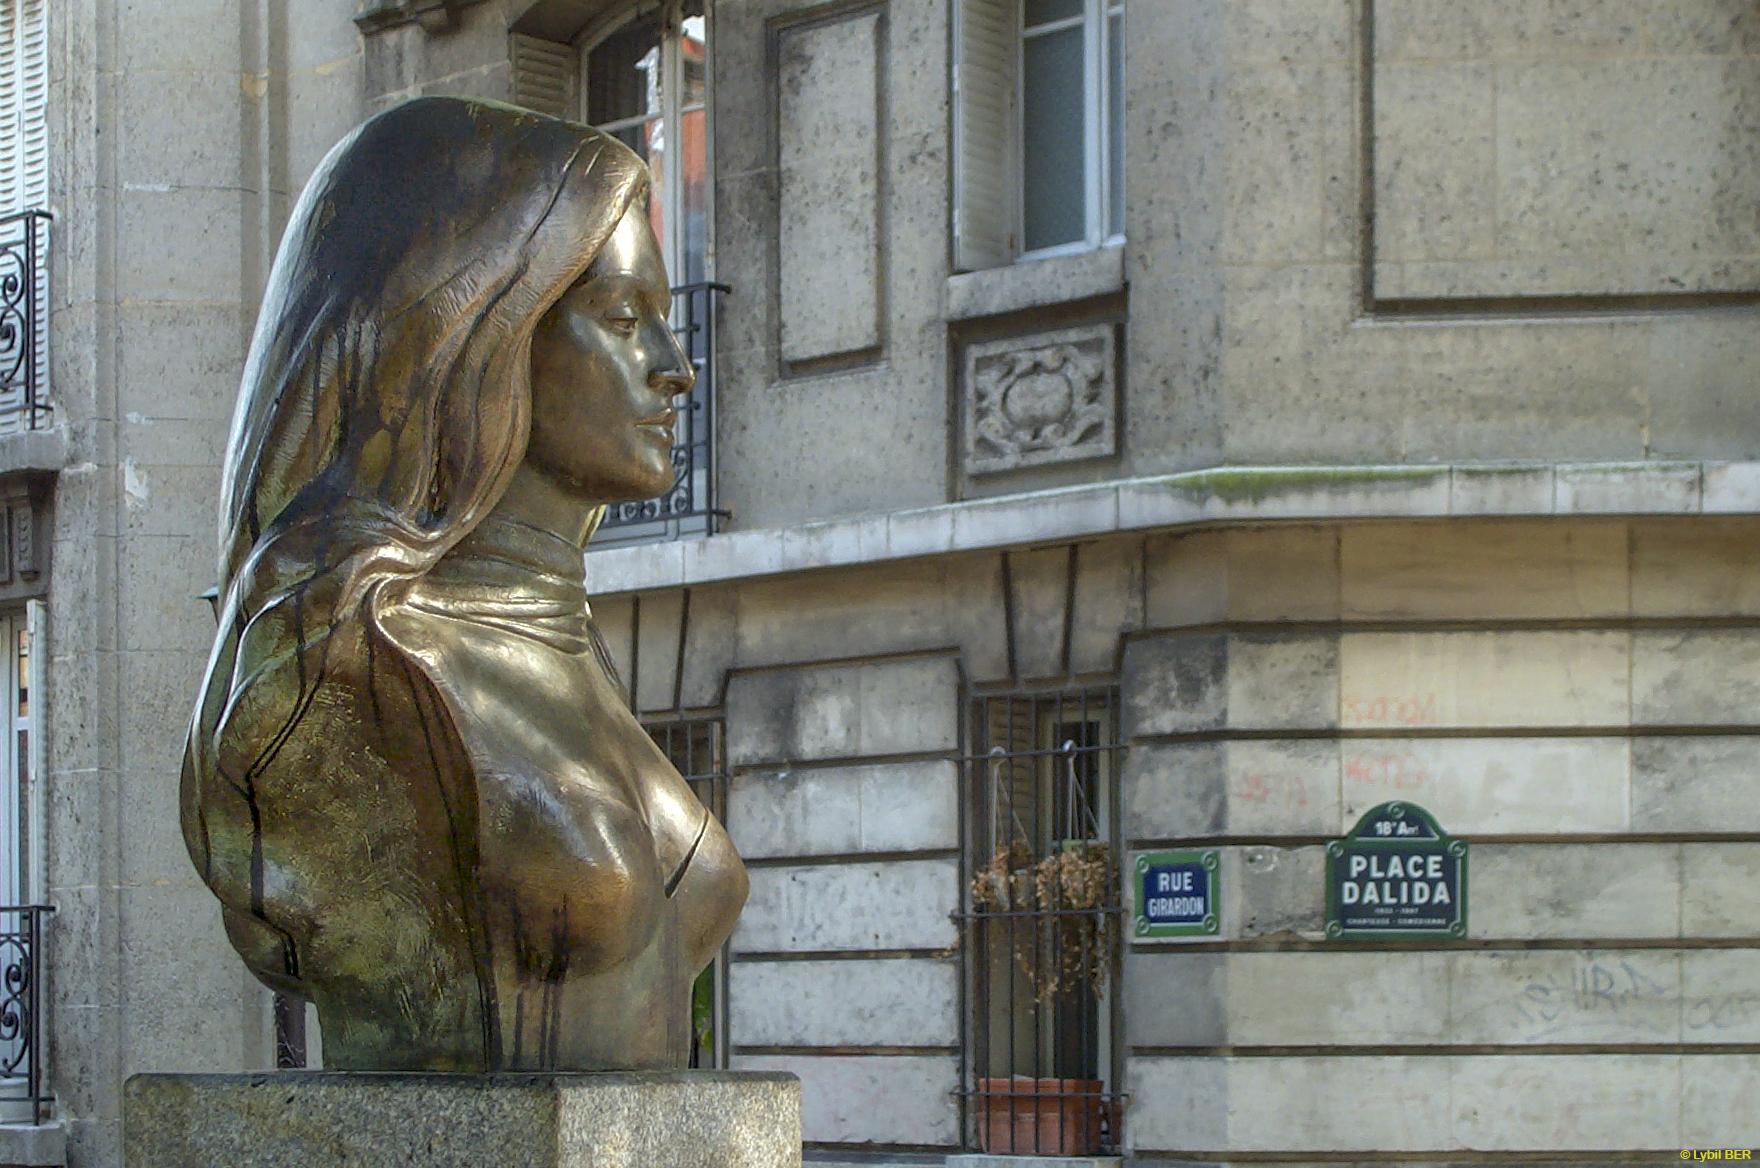 Place Dalida Bust, France